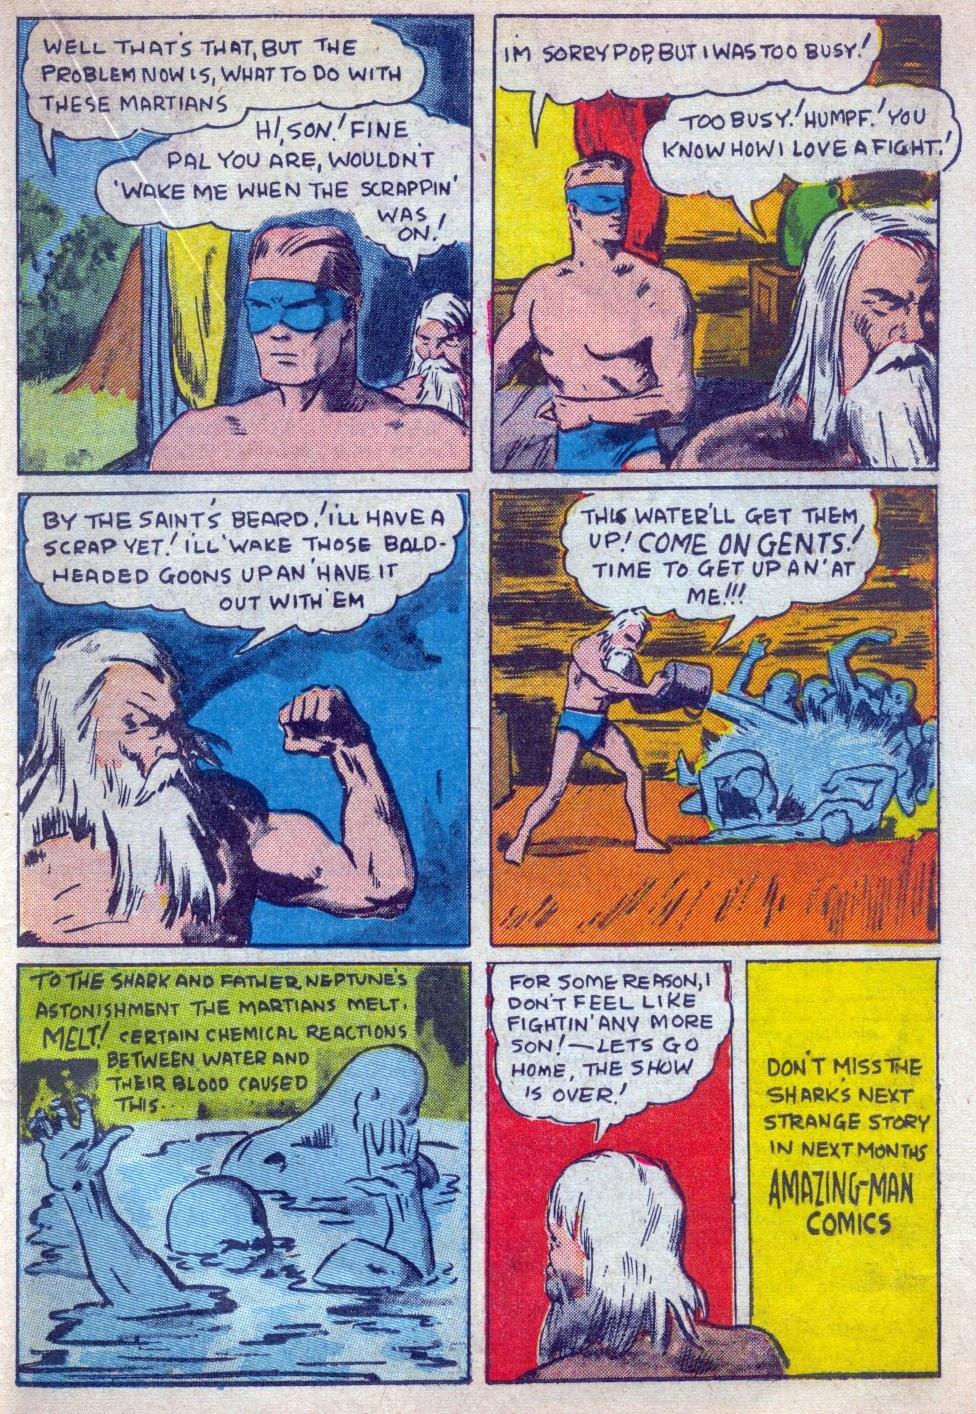 Read online Amazing Man Comics comic -  Issue #15 - 42